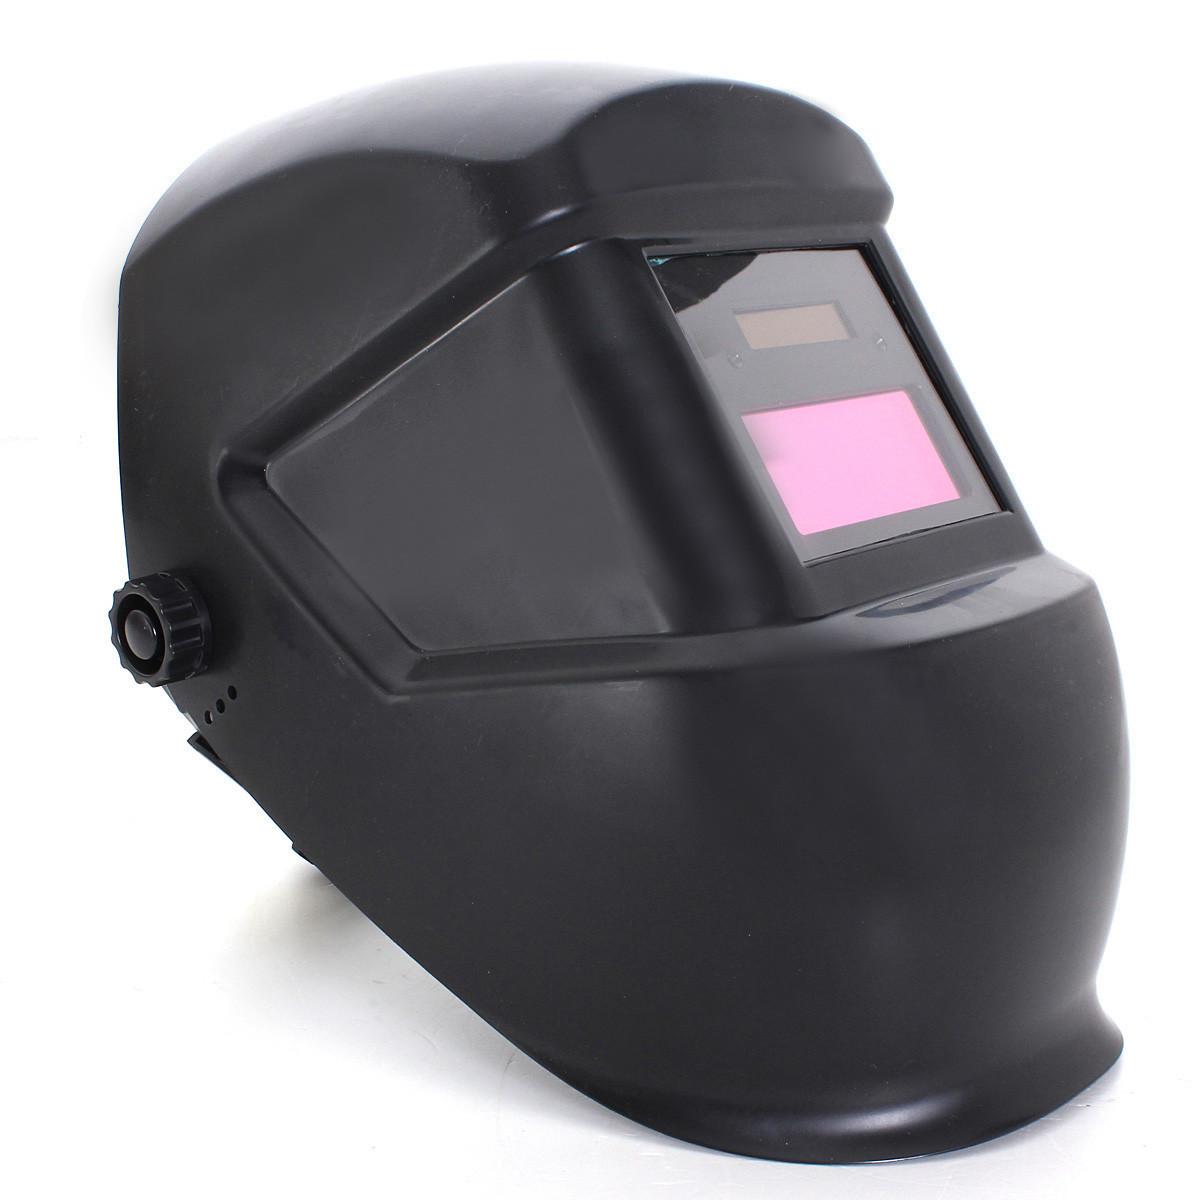 Harga Solar Auto Menjadi Gelap Welding Helmet Arc Tig Mig Masker Pelindung Hitam New